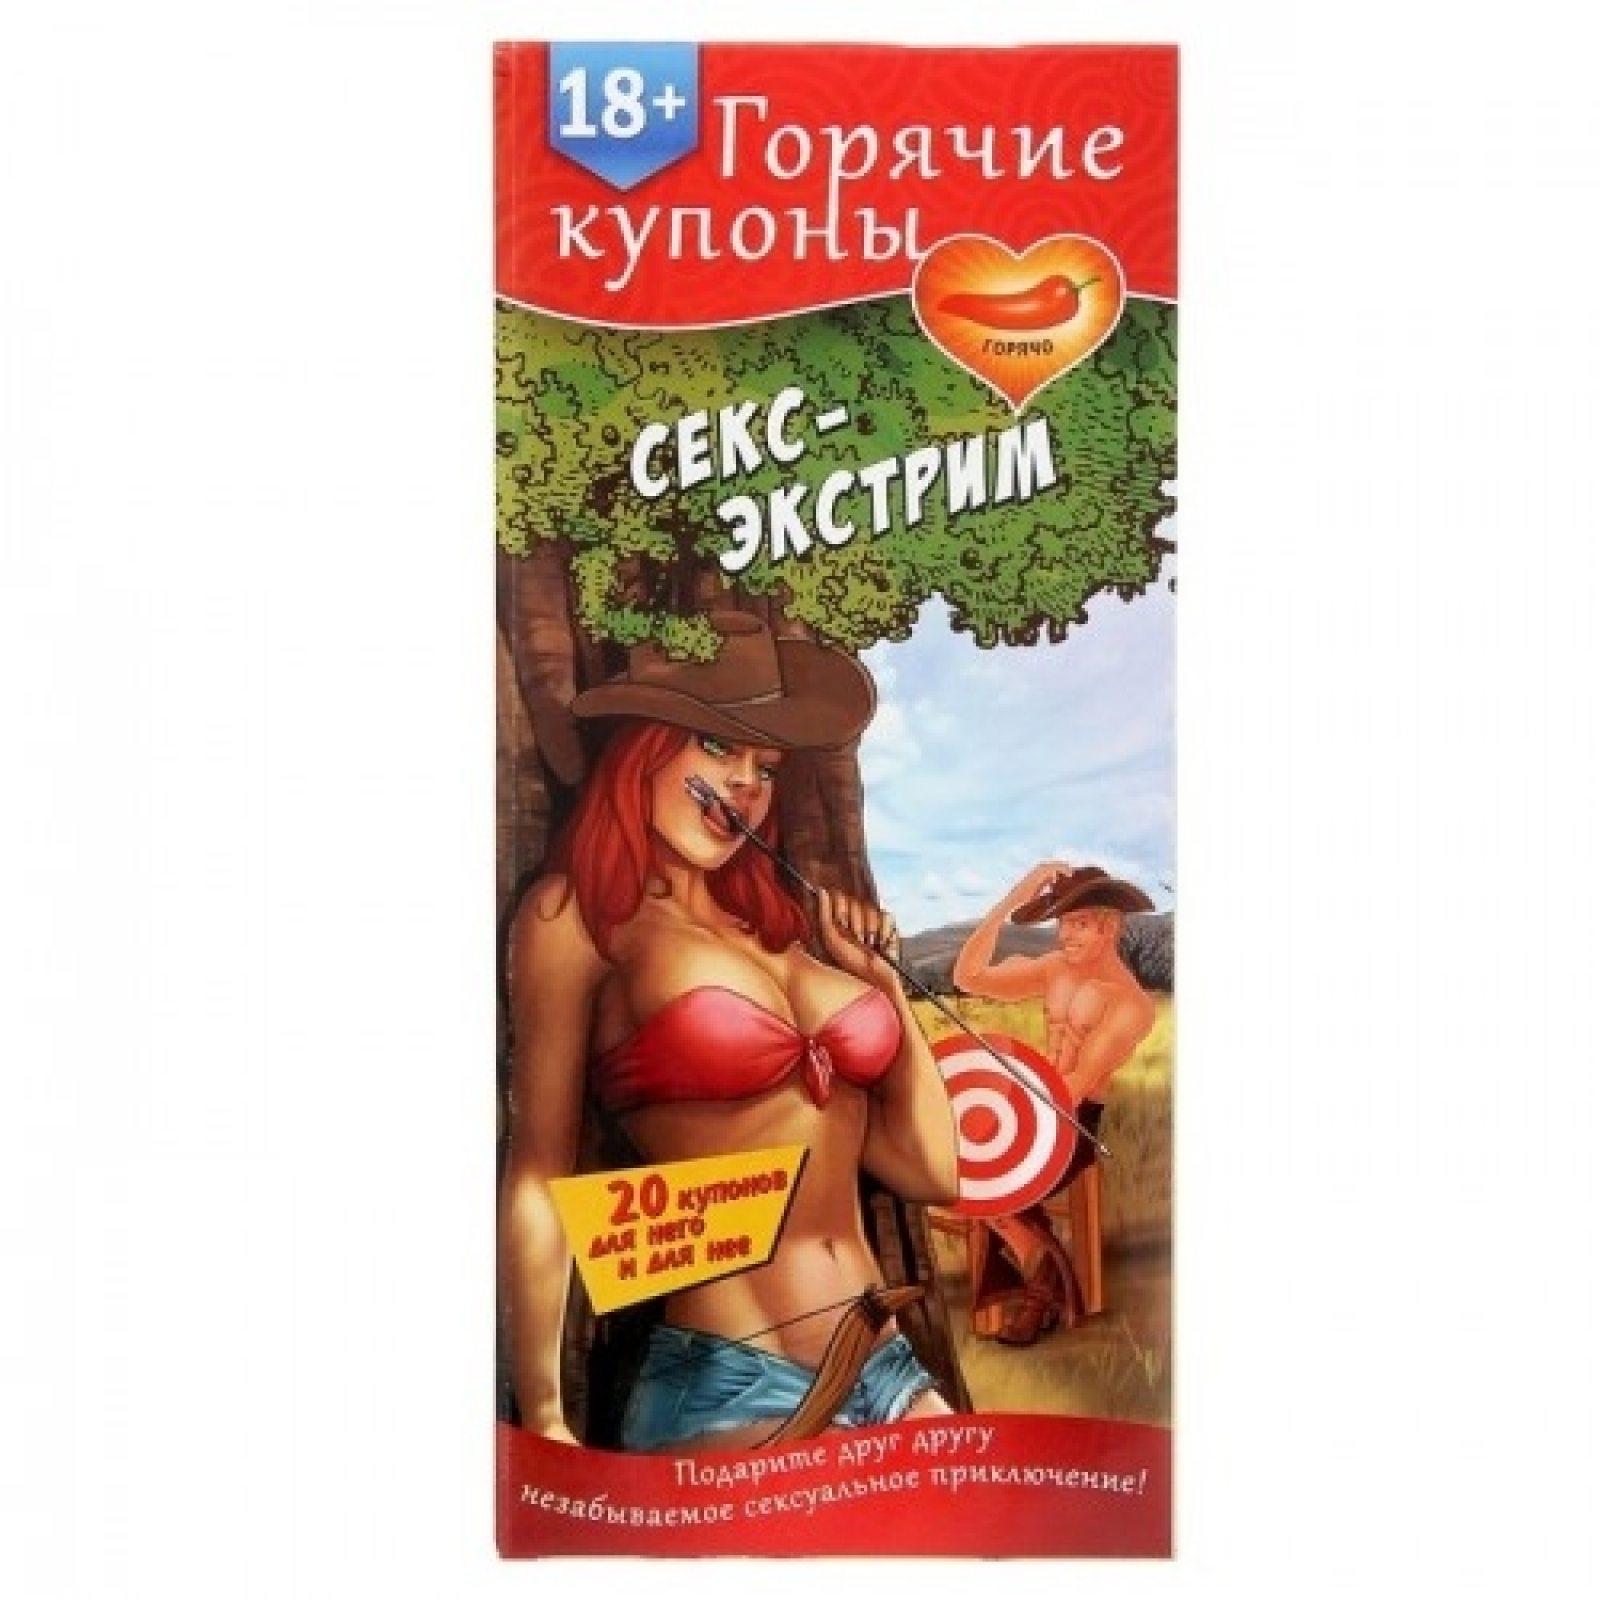 porno-onlayn-bolgariya